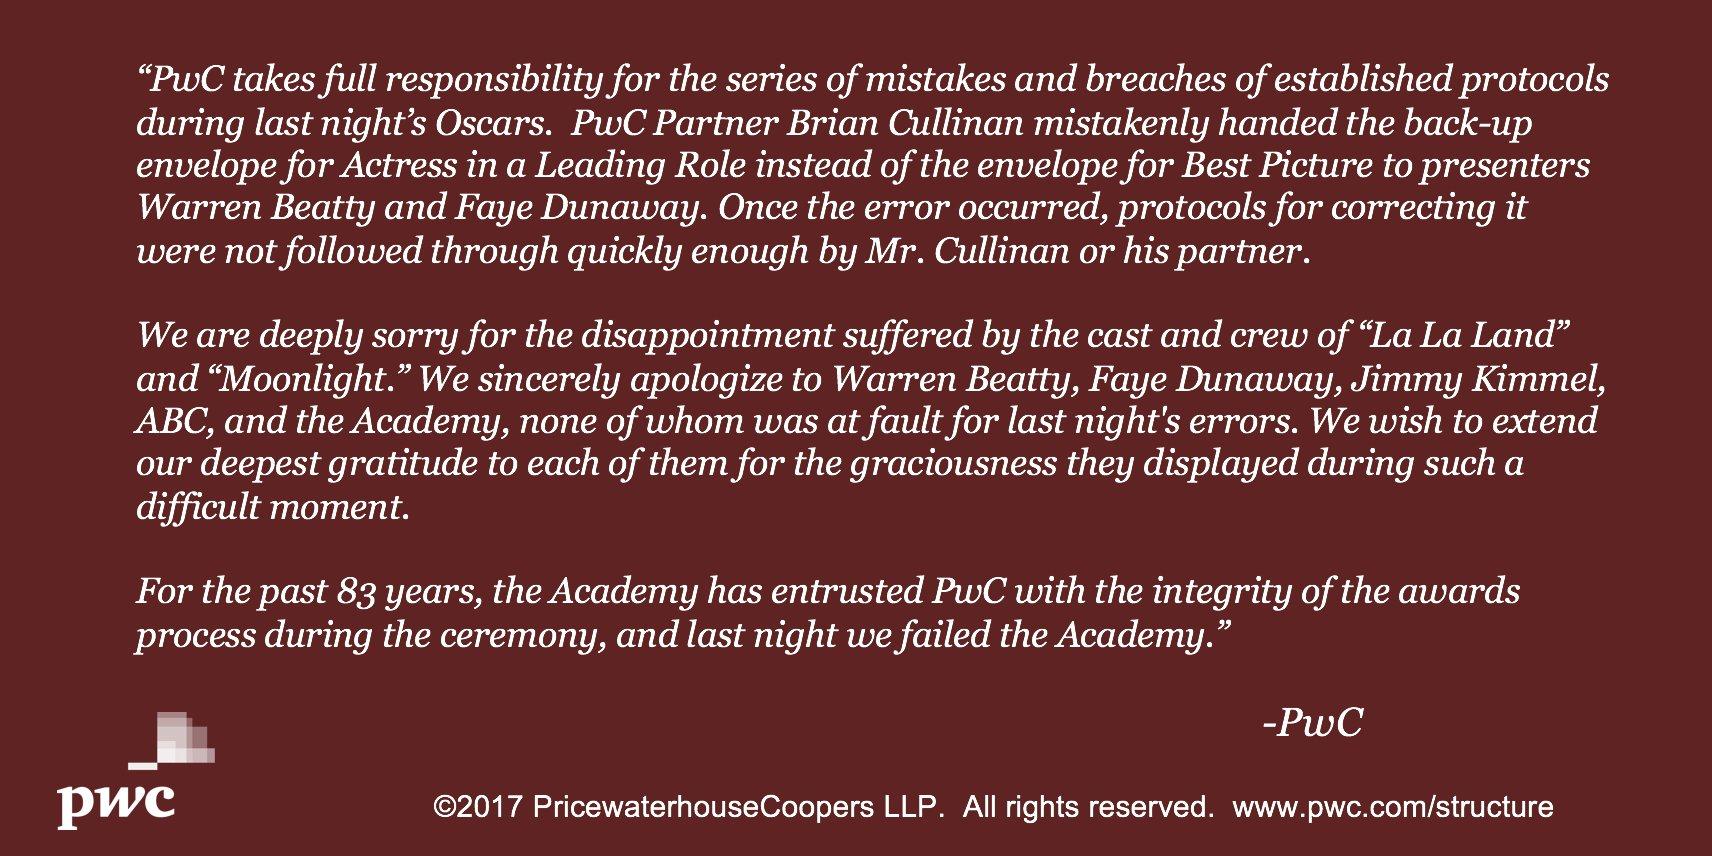 Comunicado de responsabilidade pela bronca dos Óscares empresa PwC